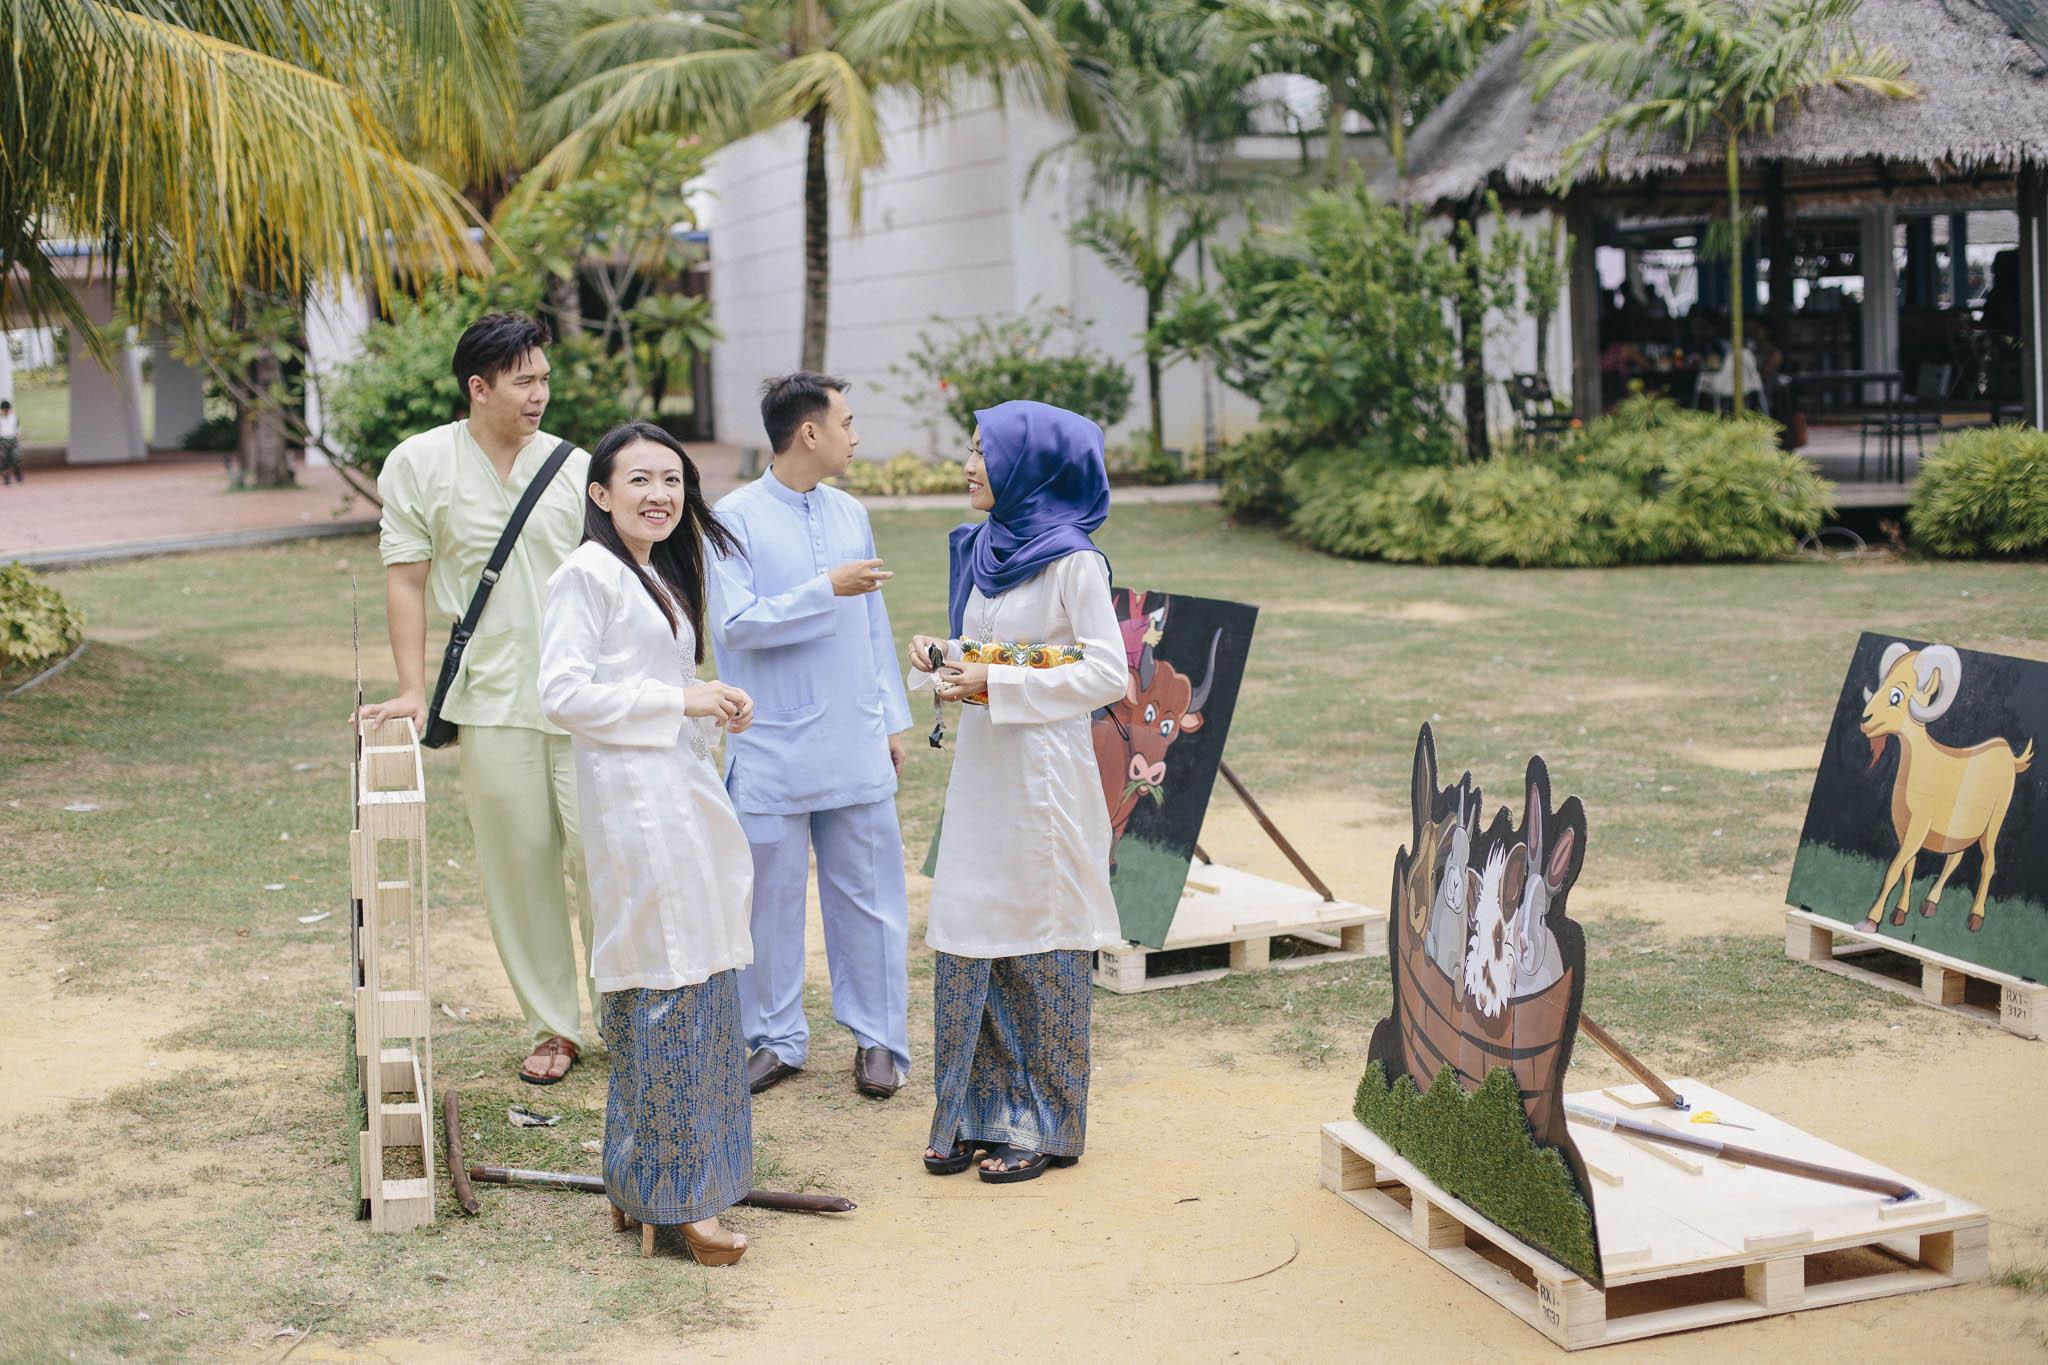 singapore-wedding-photographer-travel-khairul-atikah-37.jpg